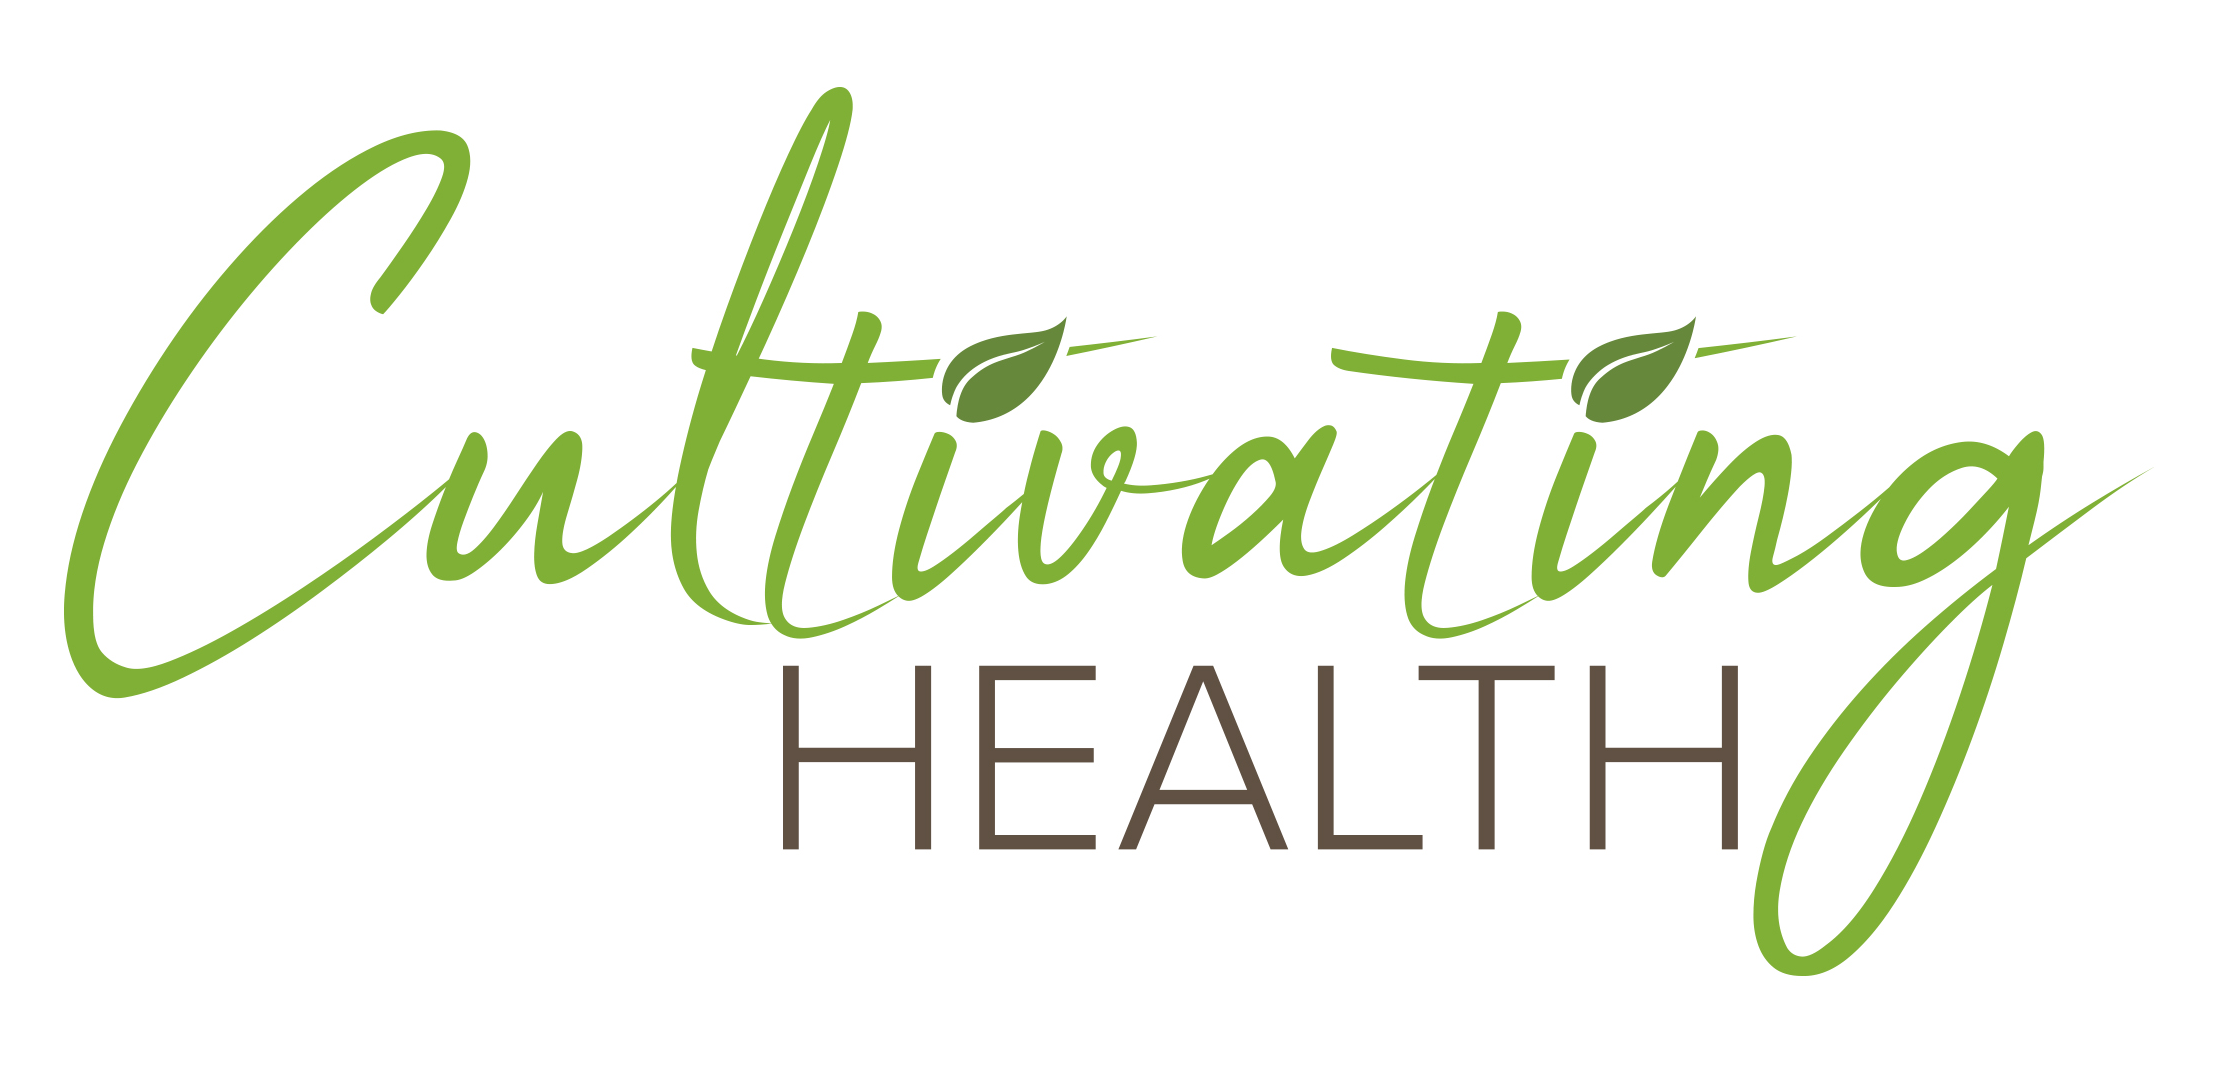 Cultivating Health Podcast - Logo Design